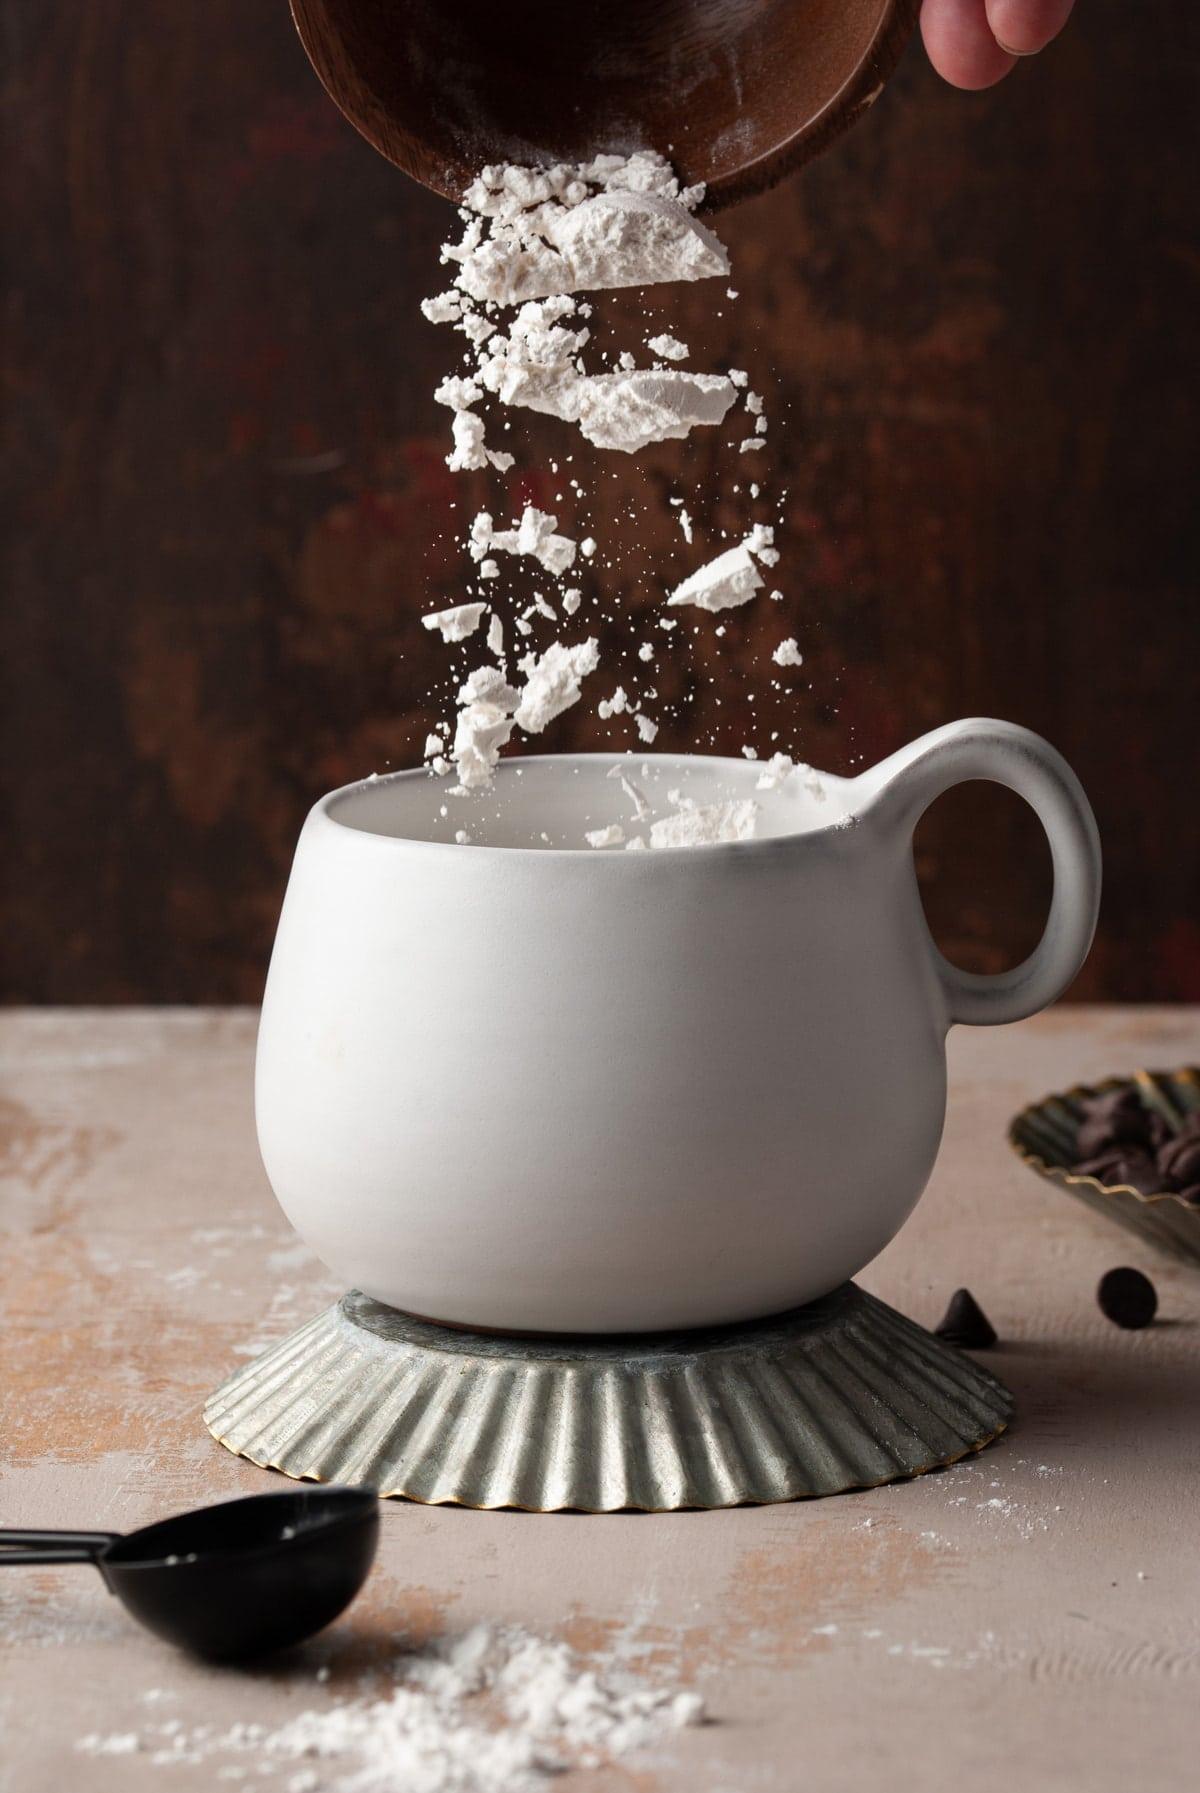 pouring flour into white mug